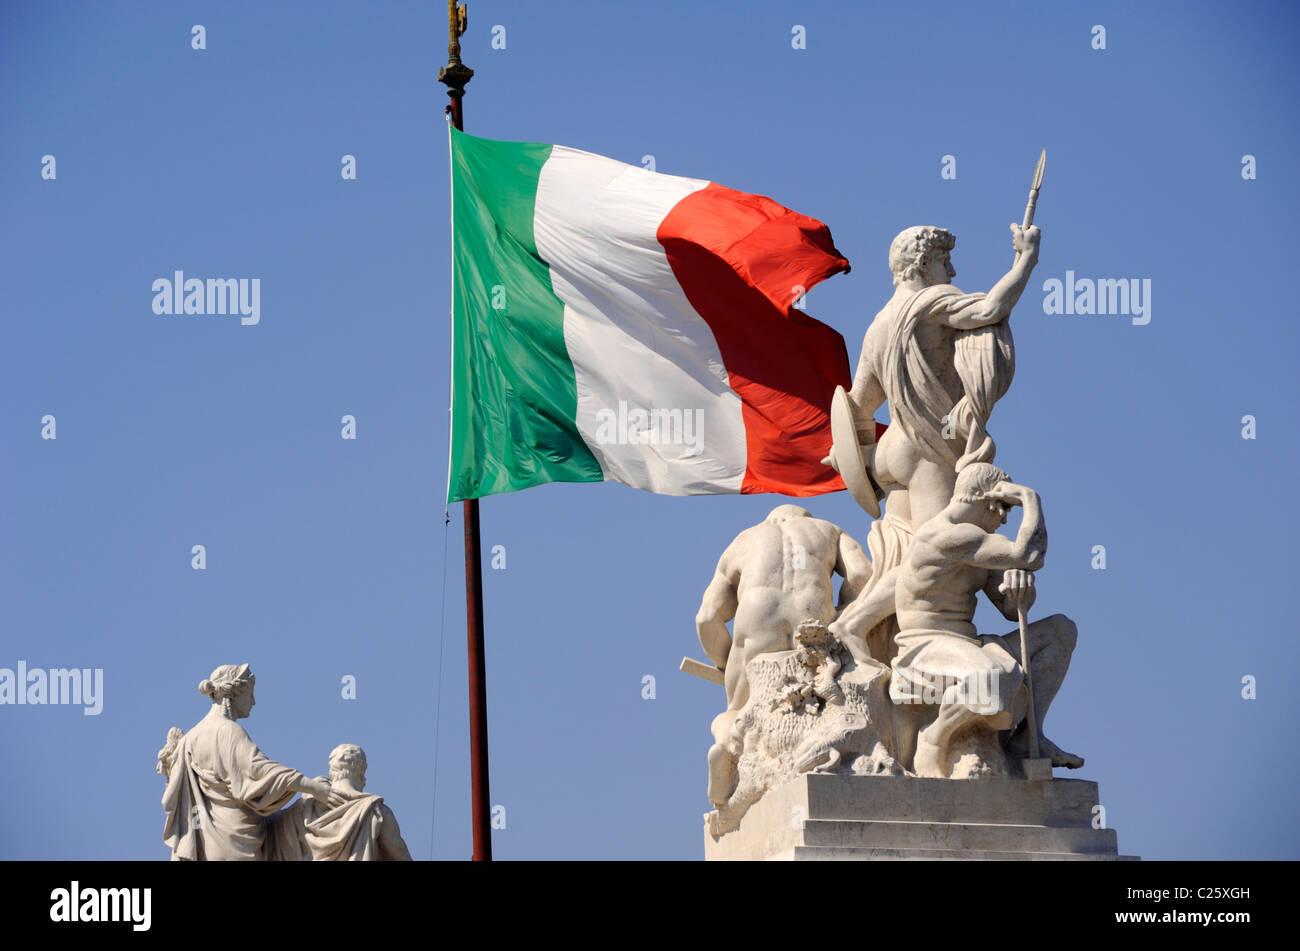 L'Italie, Rome, Piazza Venezia, le Vittoriano, statues et drapeau italien Photo Stock